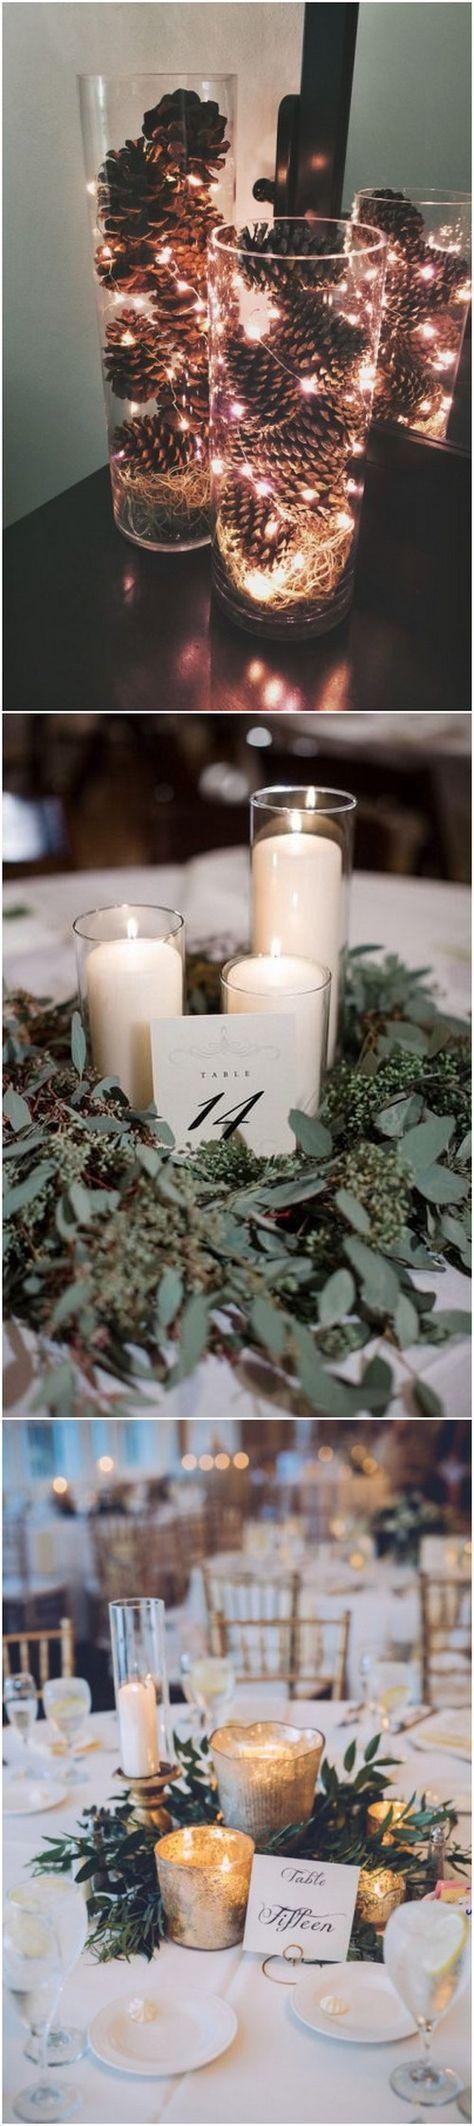 1950's wedding decorations november 2018  best Mum u Dad images on Pinterest  Wedding ideas Bridal